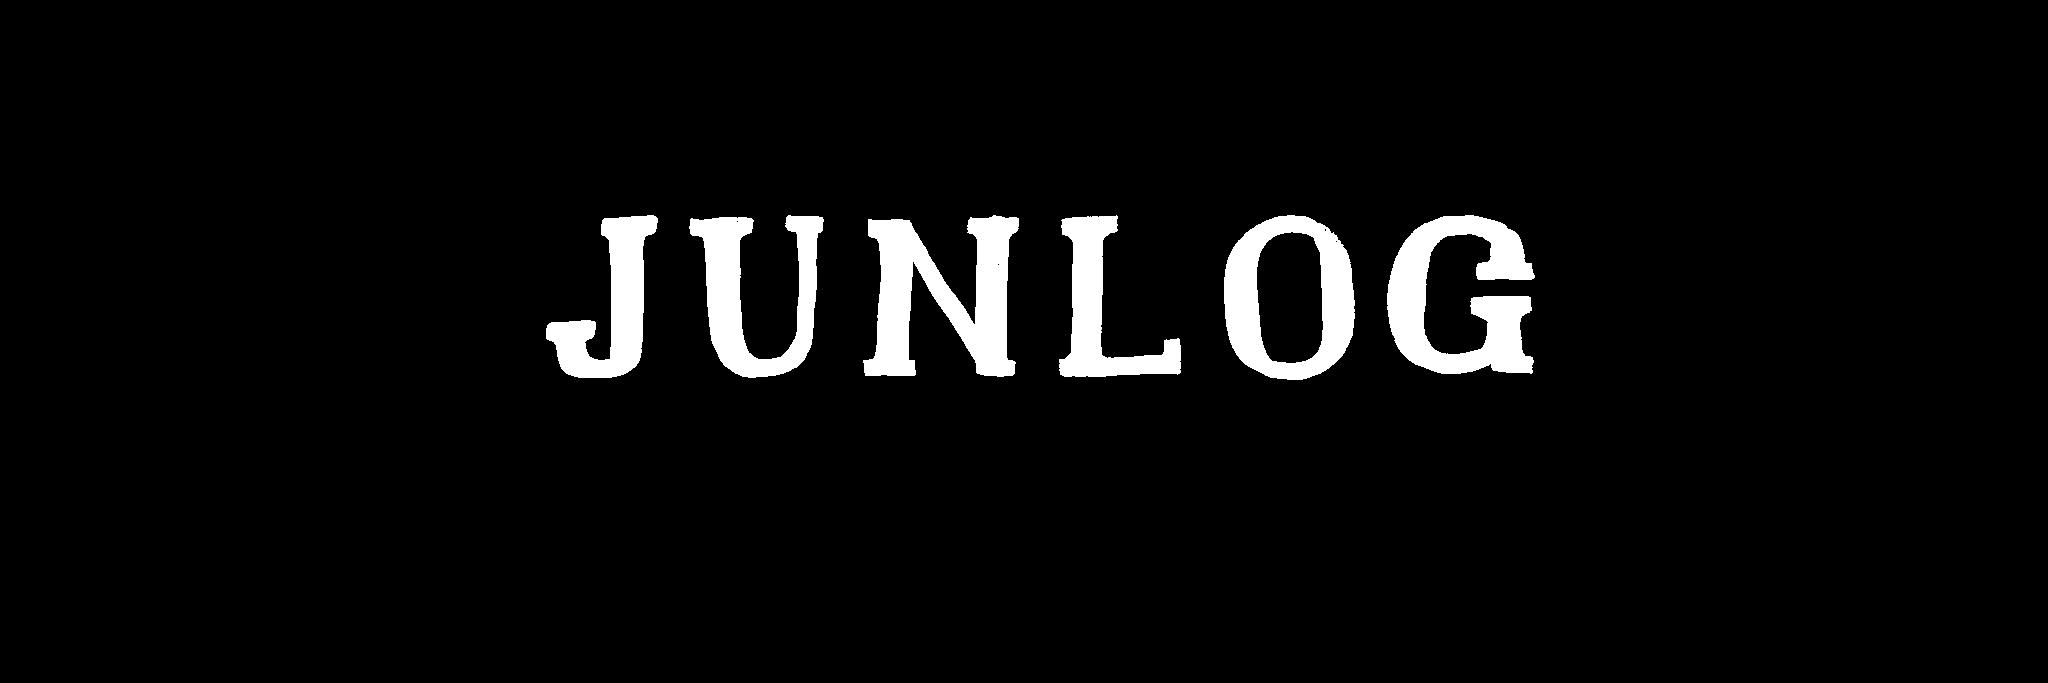 JUNLOG